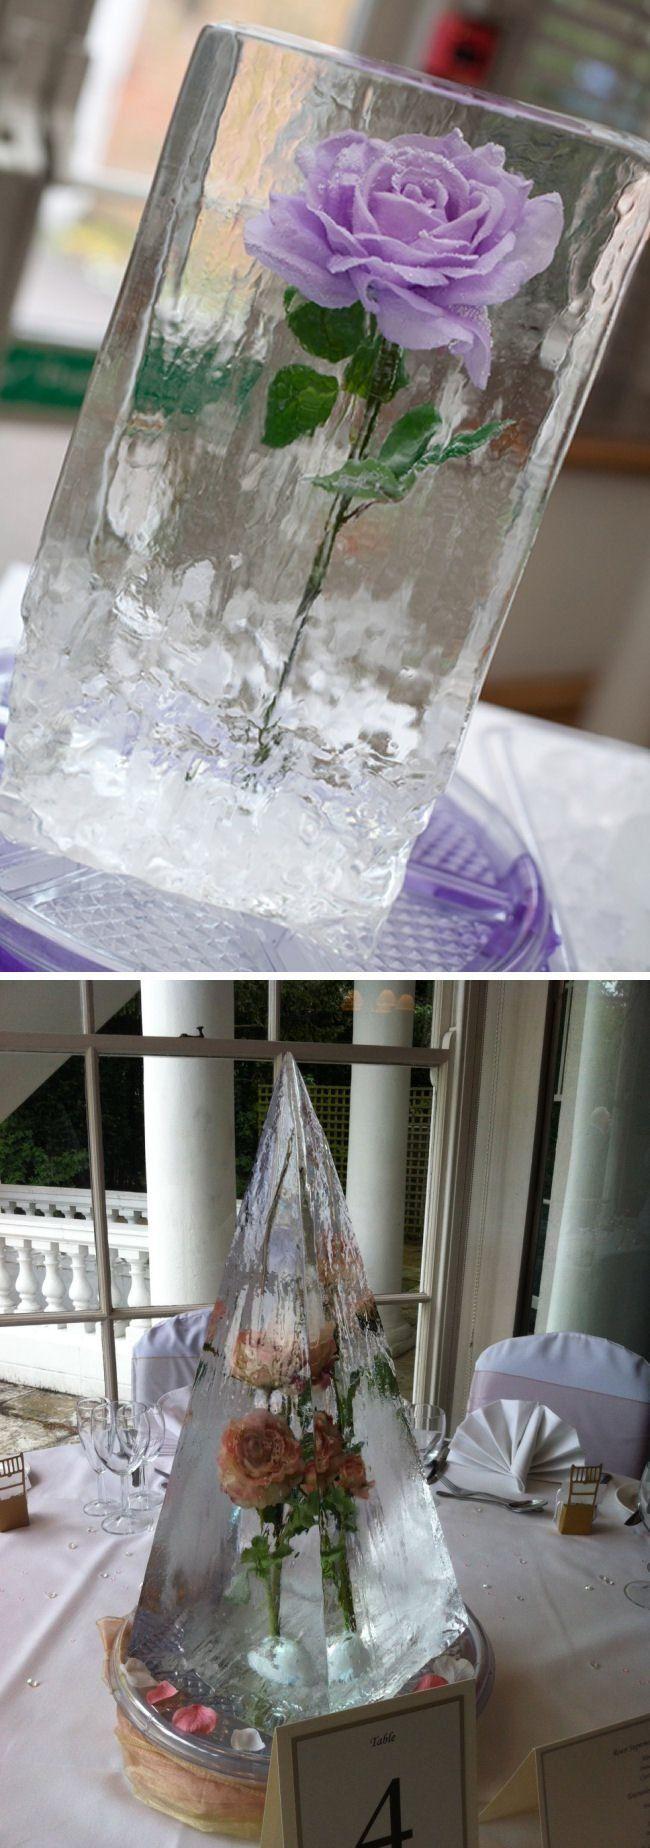 Q&A on wedding ice sculptures